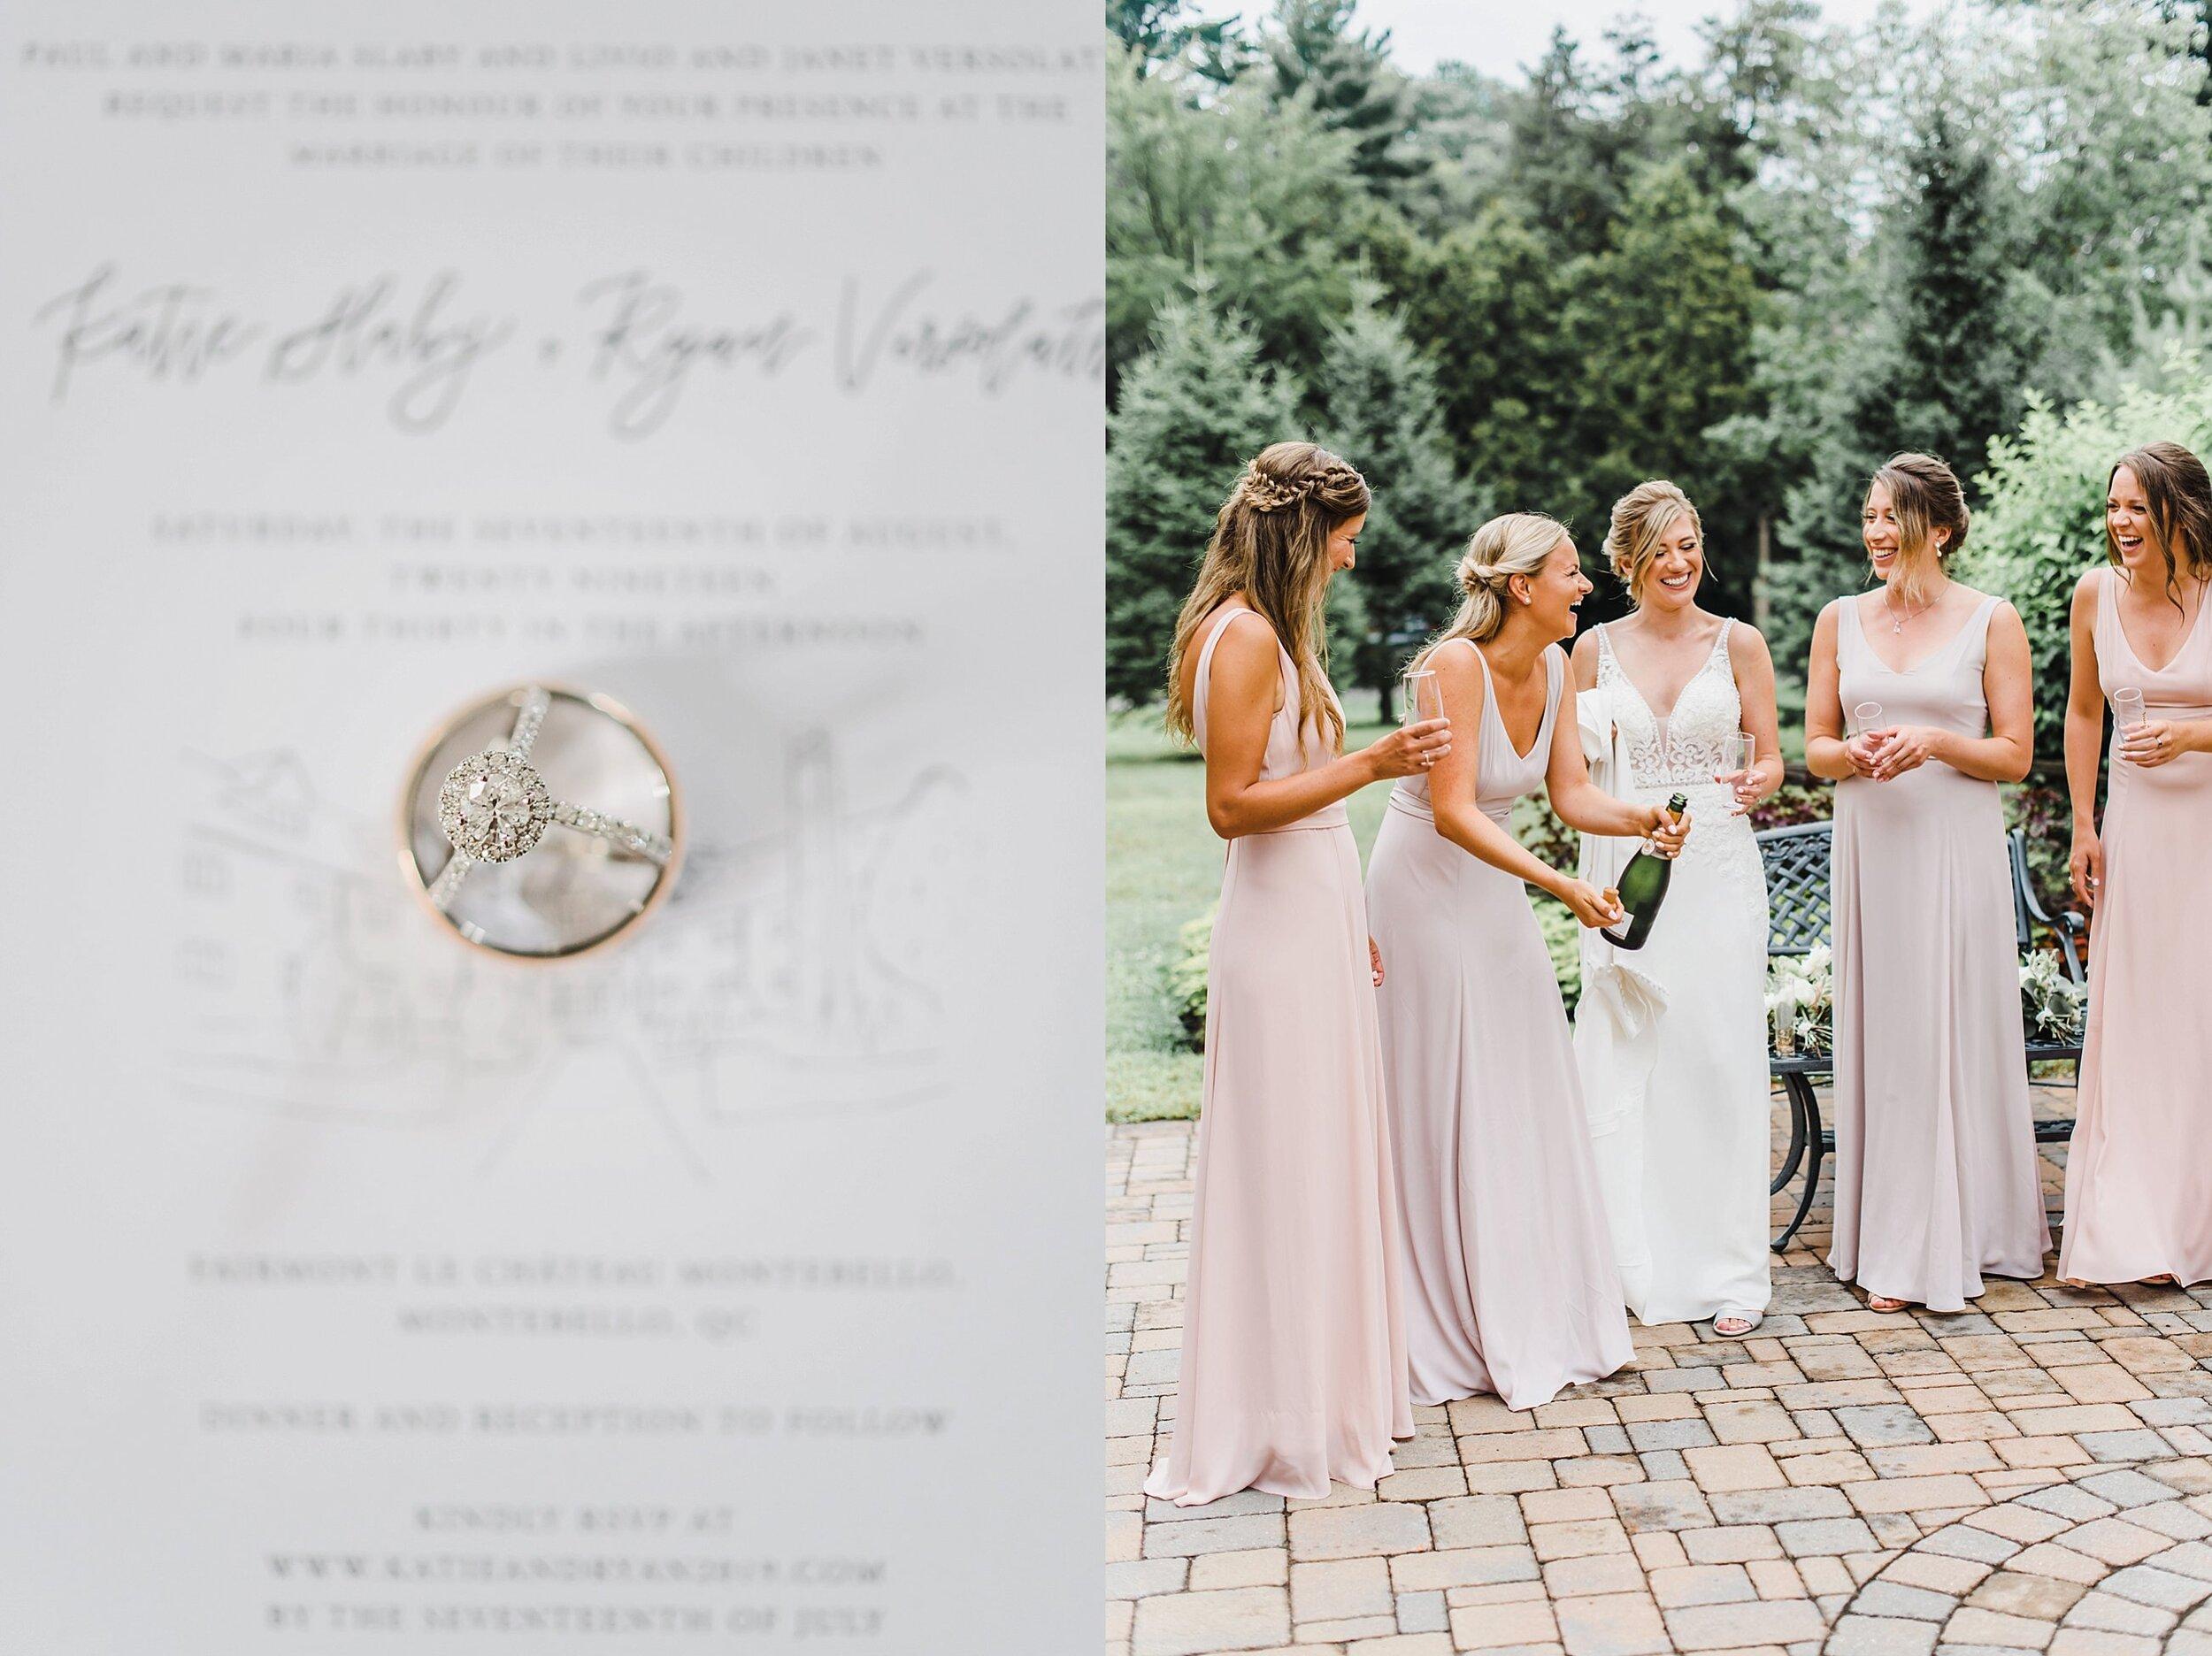 light airy fine art ottawa wedding photographer | Ali and Batoul Photography | Fairmont Le Chateau Montebello13.jpg